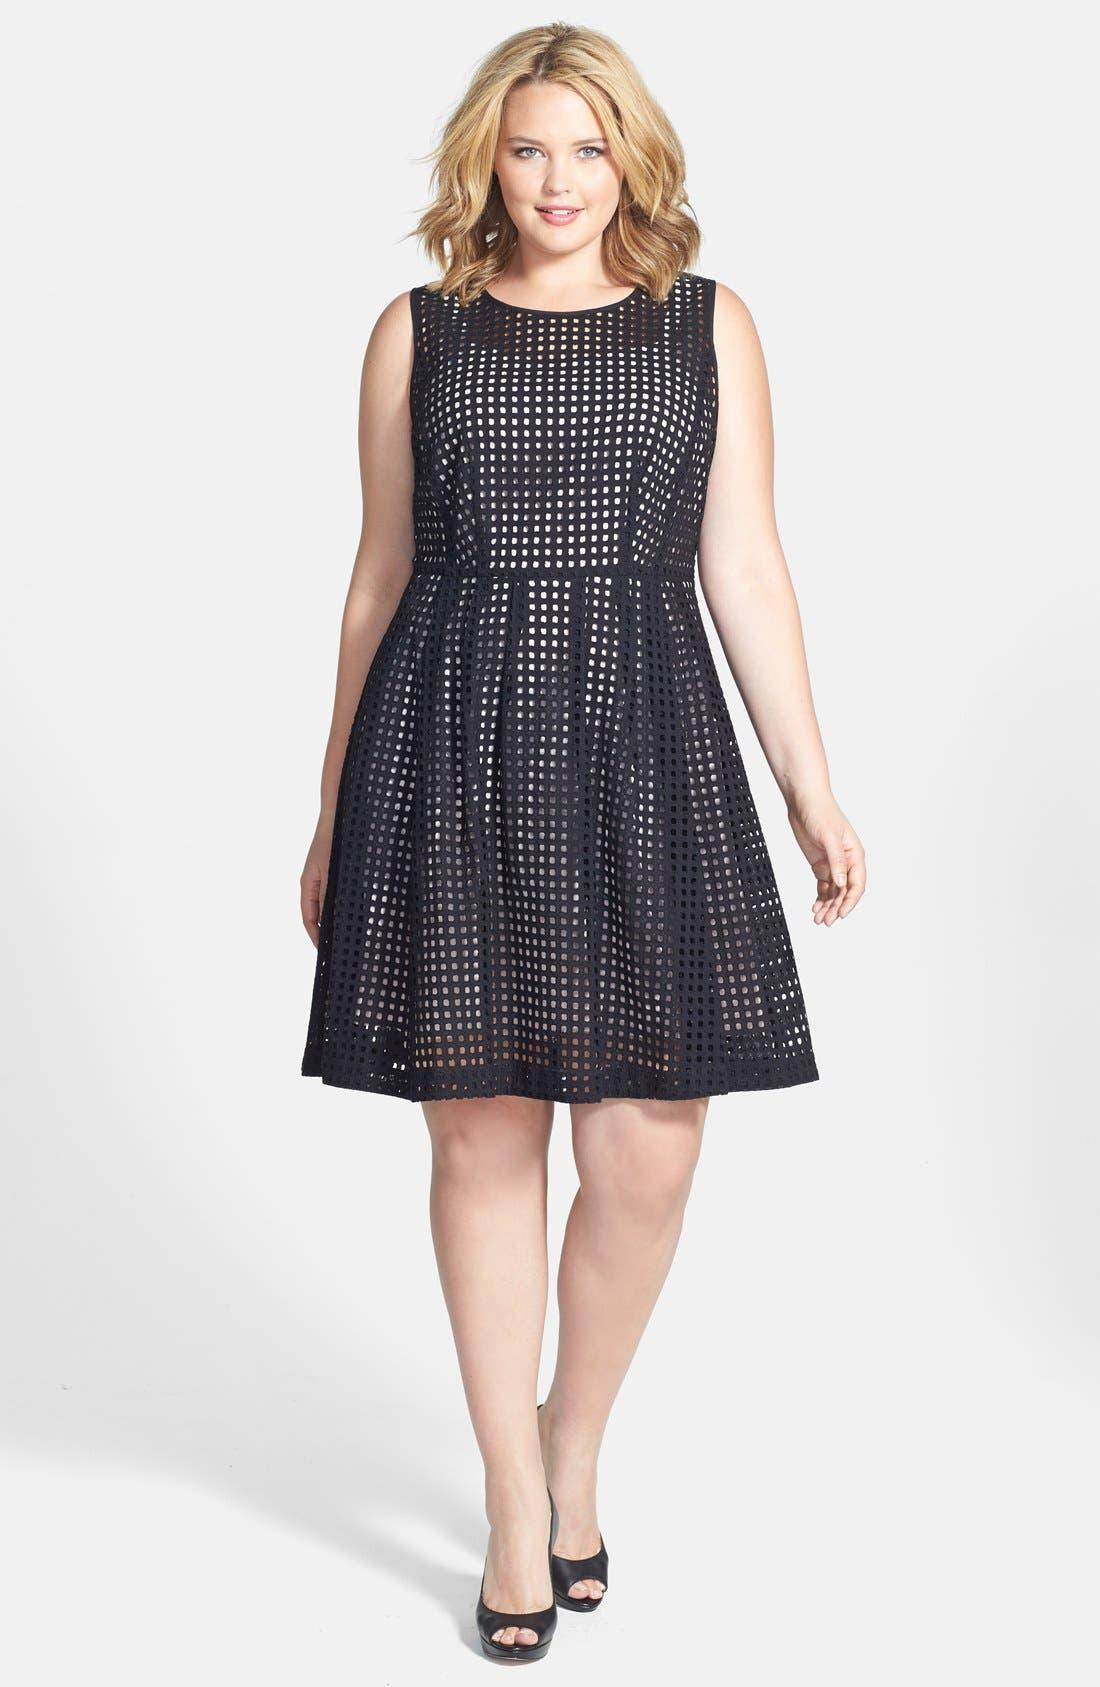 Main Image - Halogen® 'Prism' Eyelet Cotton Fit & Flare Dress (Plus Size)